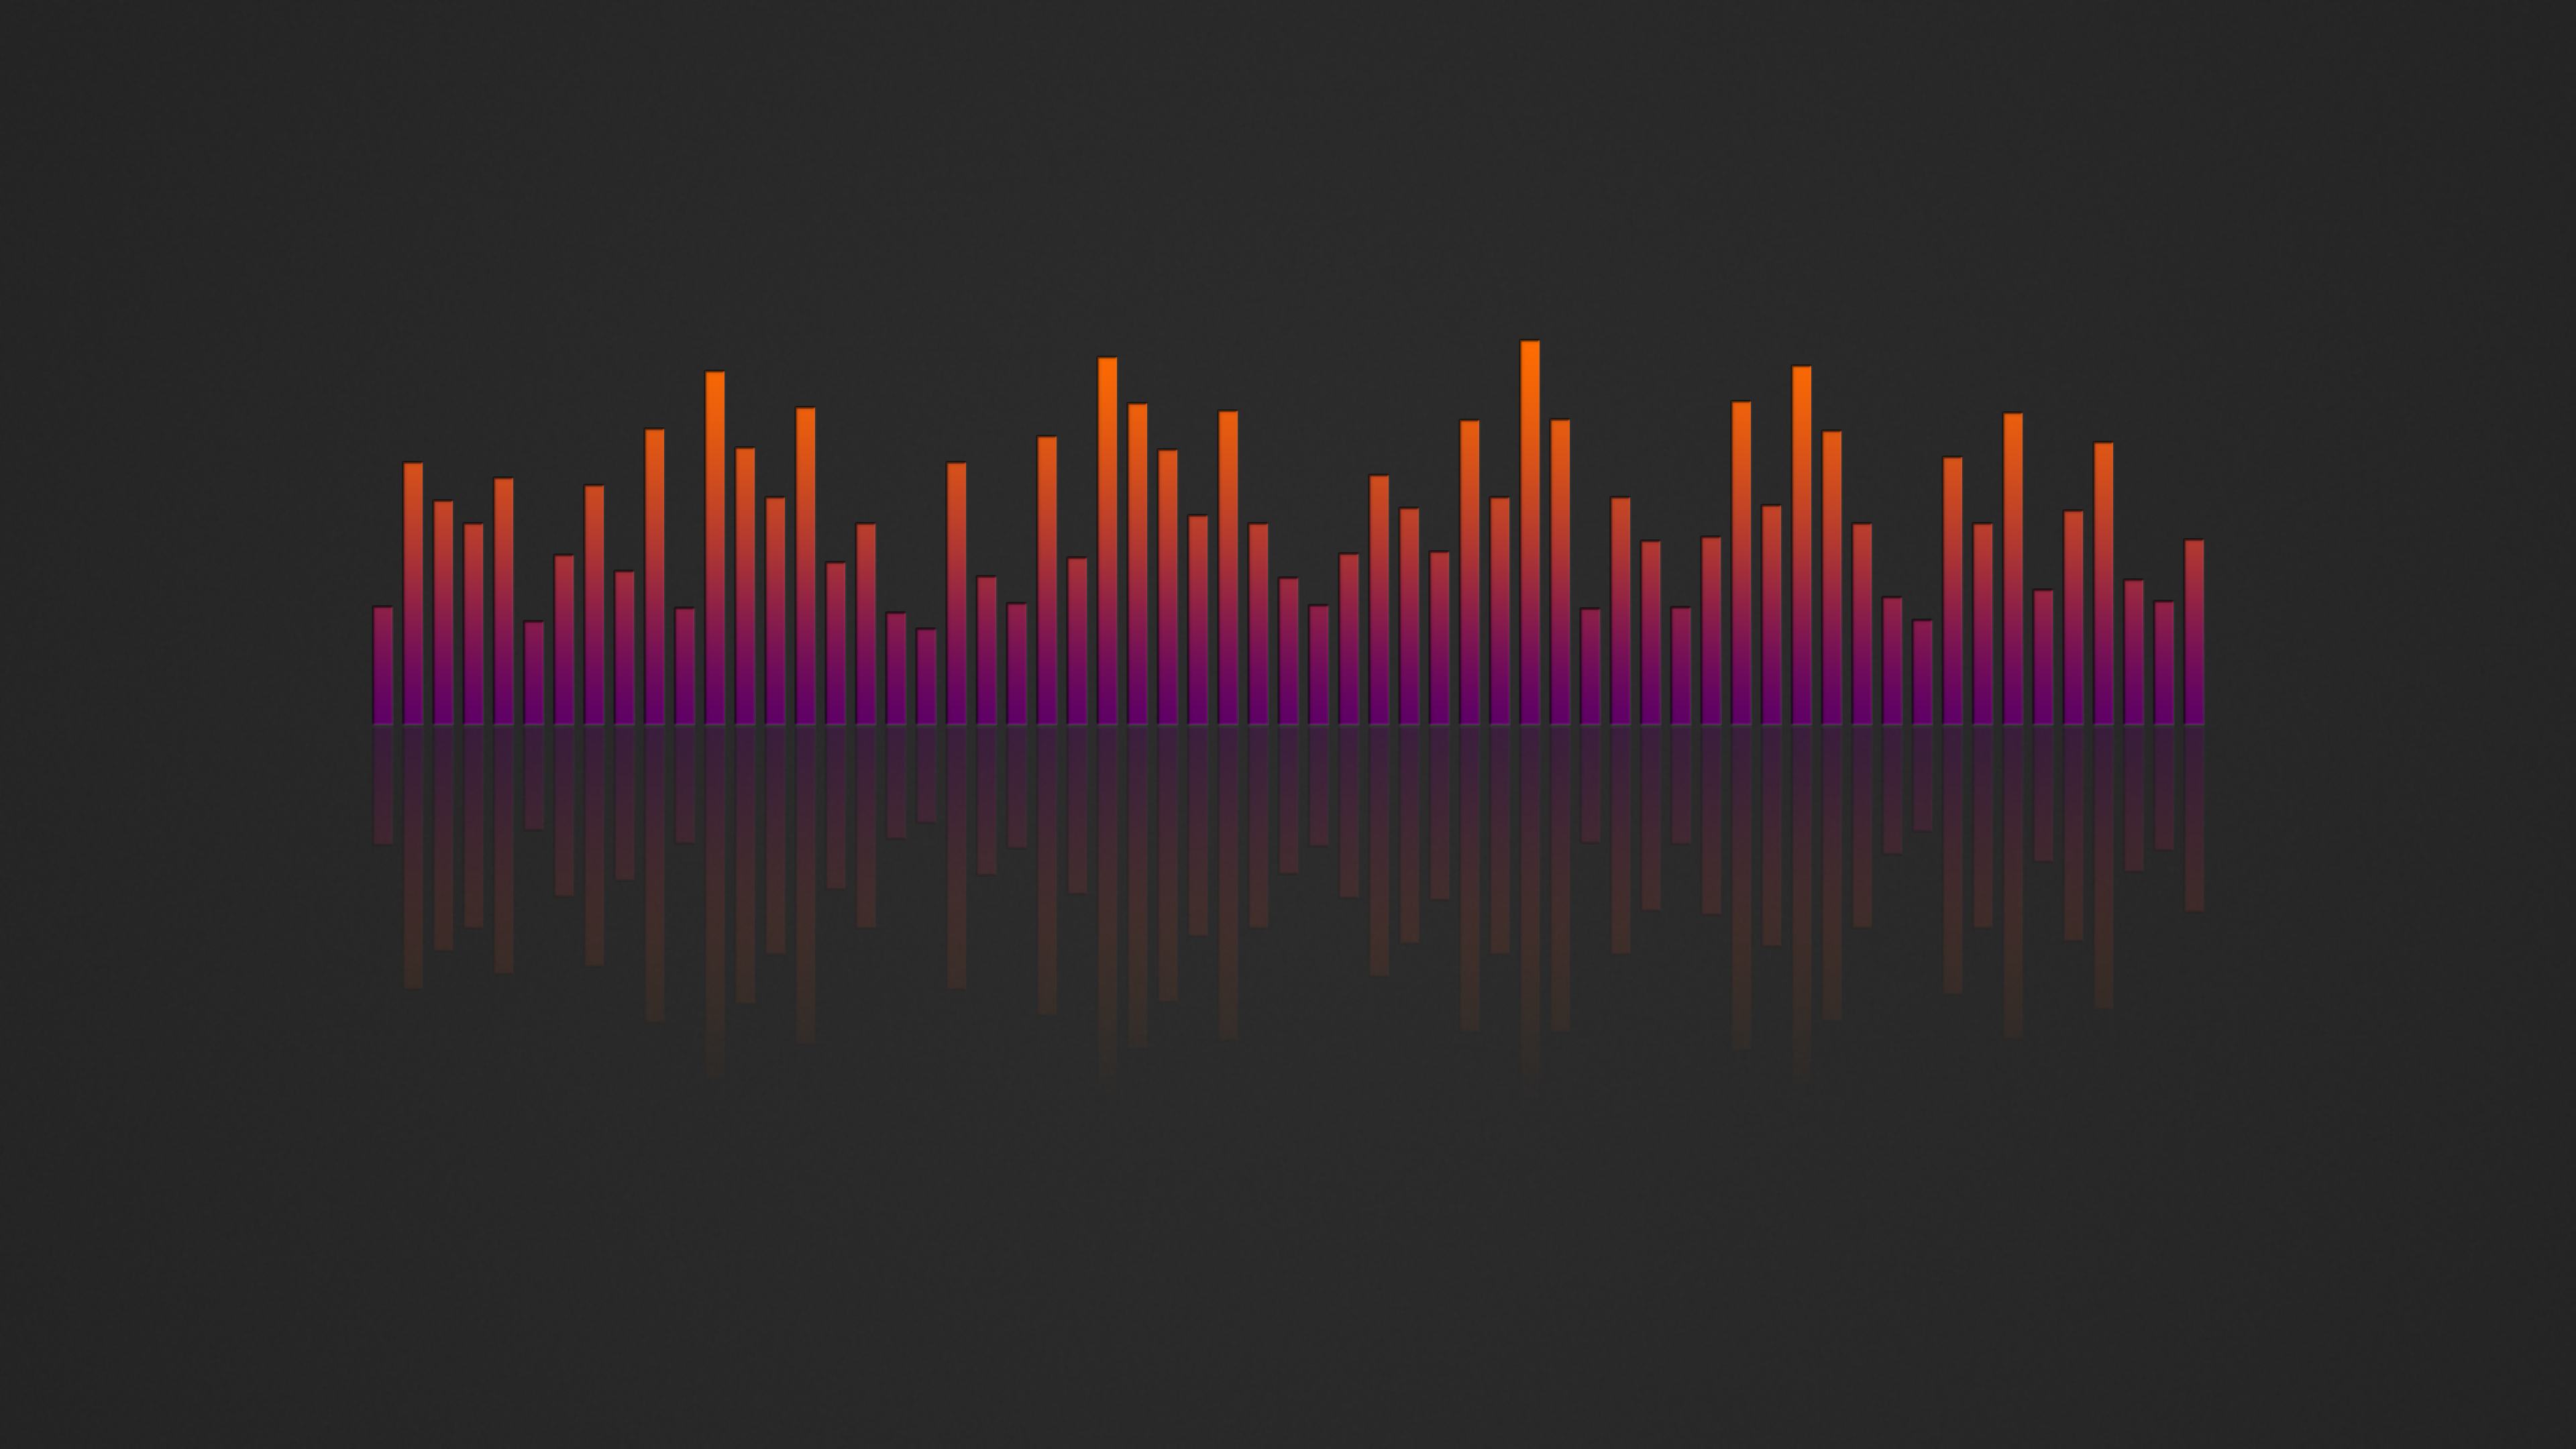 Music Visualizer 4k Wallpaper Orange Purple By Rv770 On